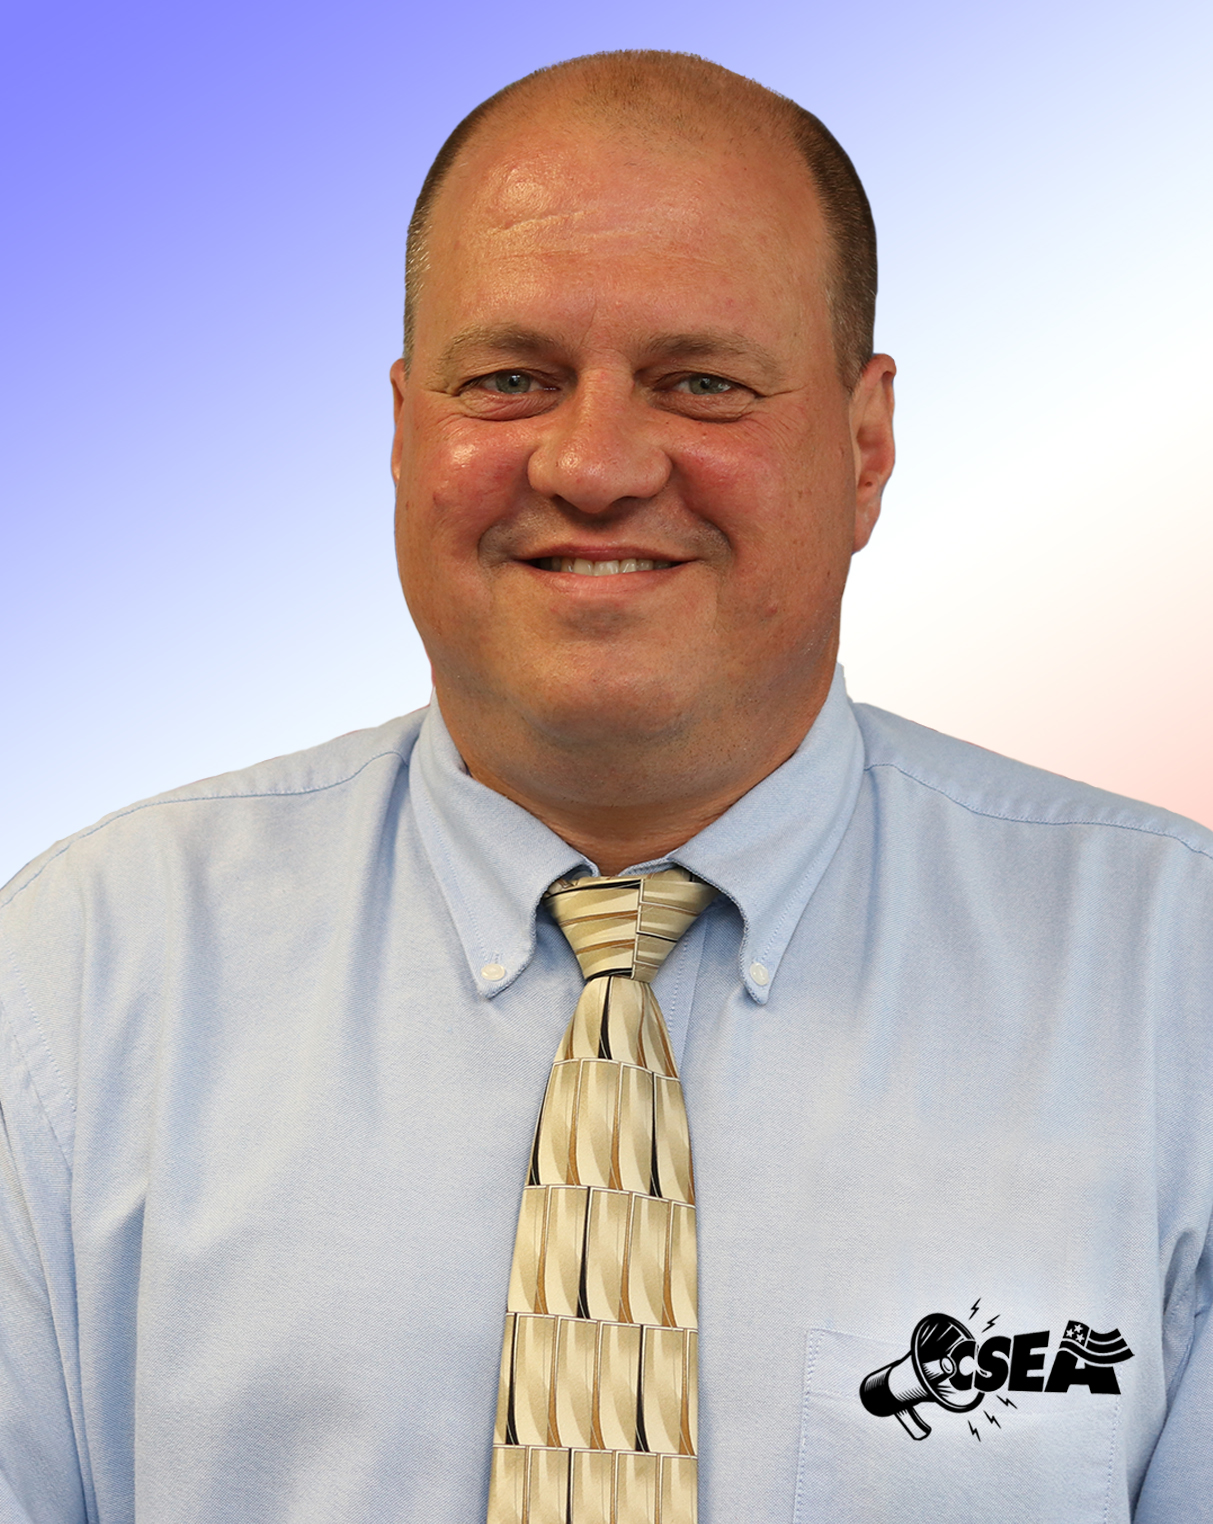 GlenTuifel - CSEA Local 830 Vice President